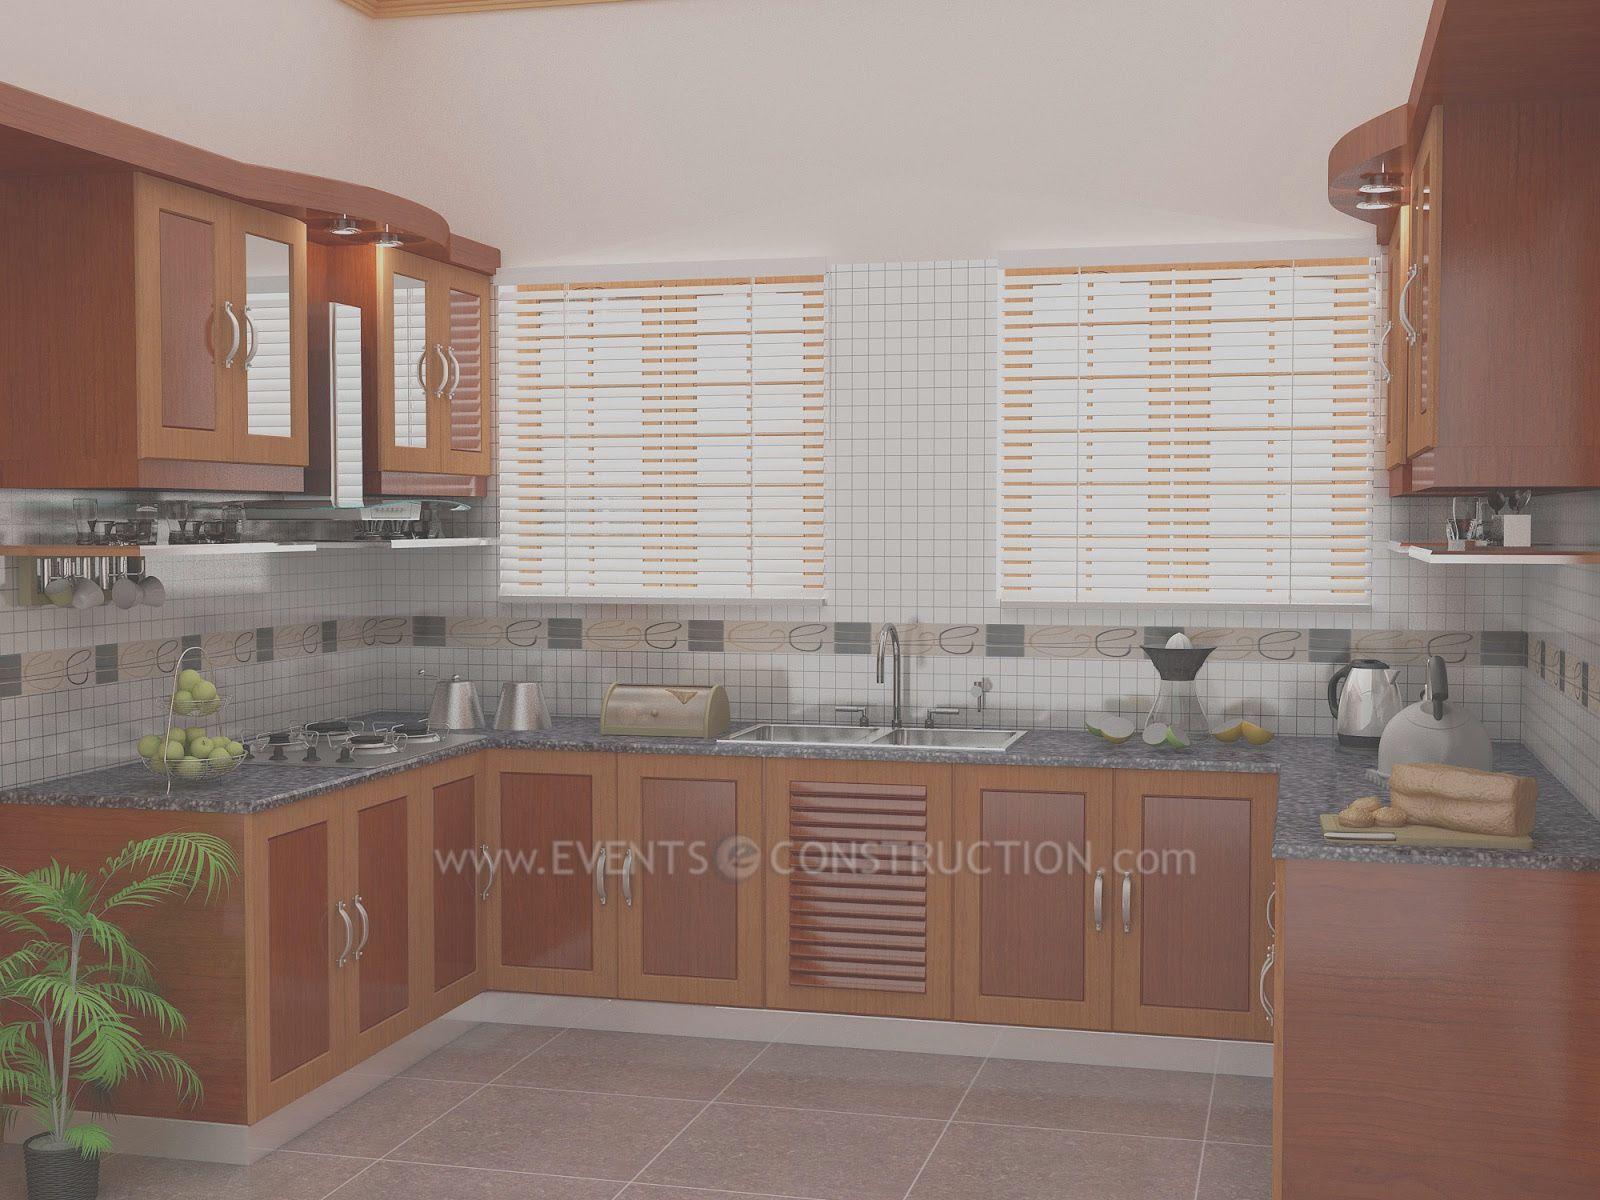 Evens Construction Pvt Ltd Simple Kerala kitchen design   Kitchen ...